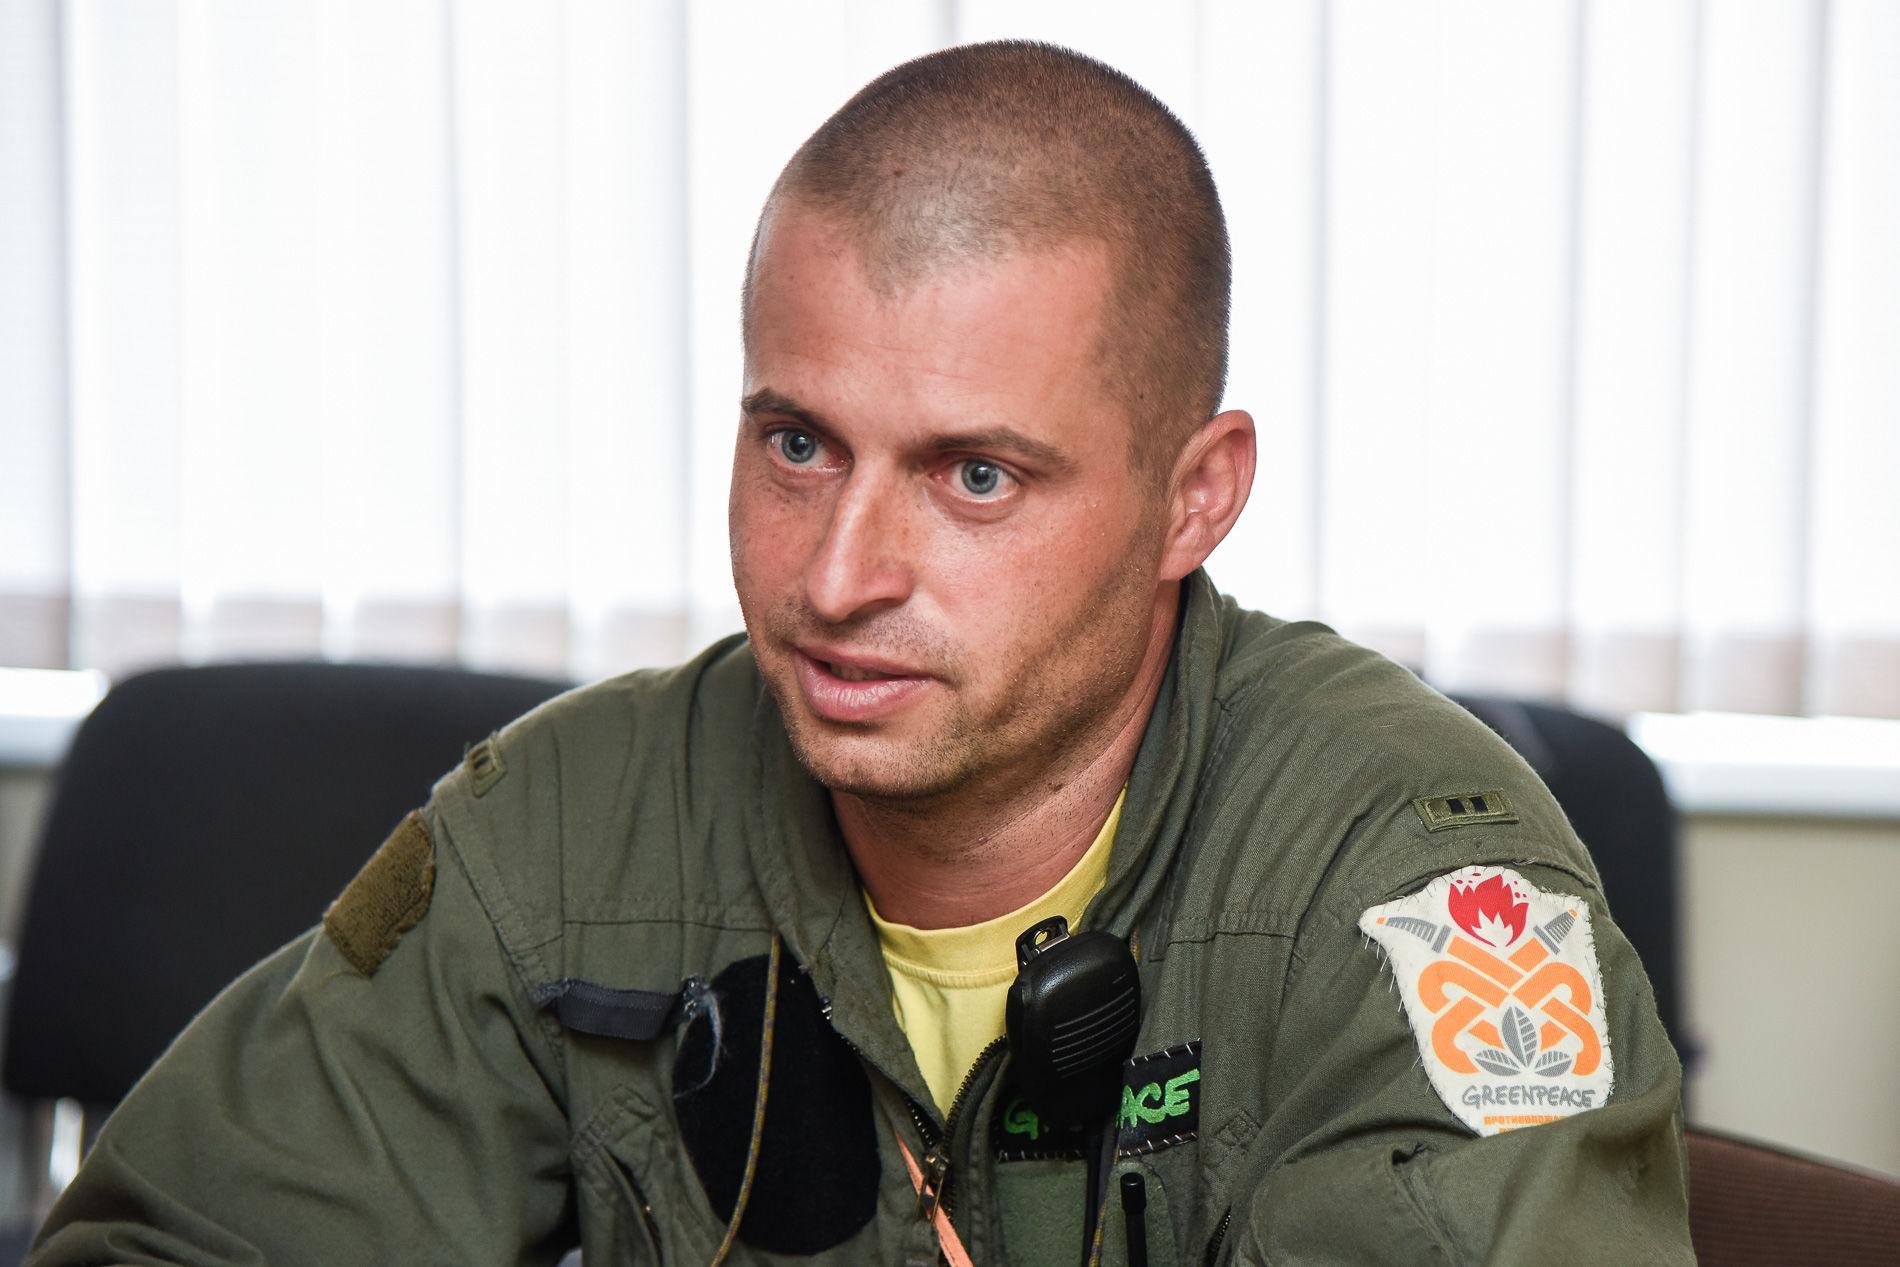 Георгий Куксин ©Фото Елены Синеок, Юга.ру